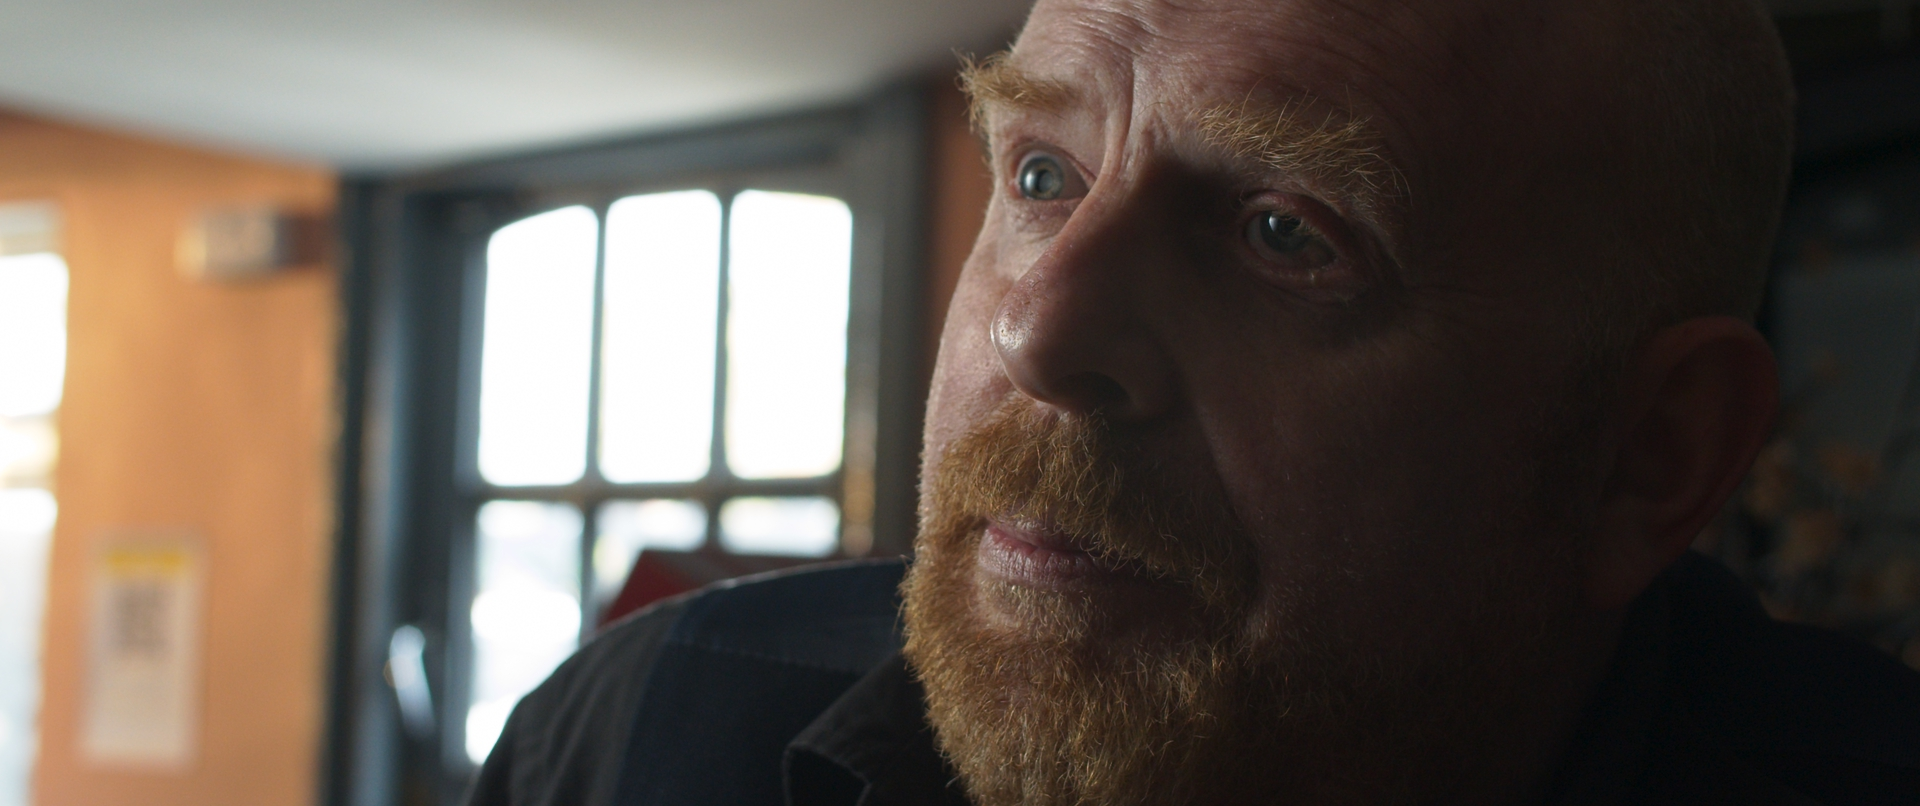 Still from short film True Purpose directed by Ben Sanderson starring Richard Simpson